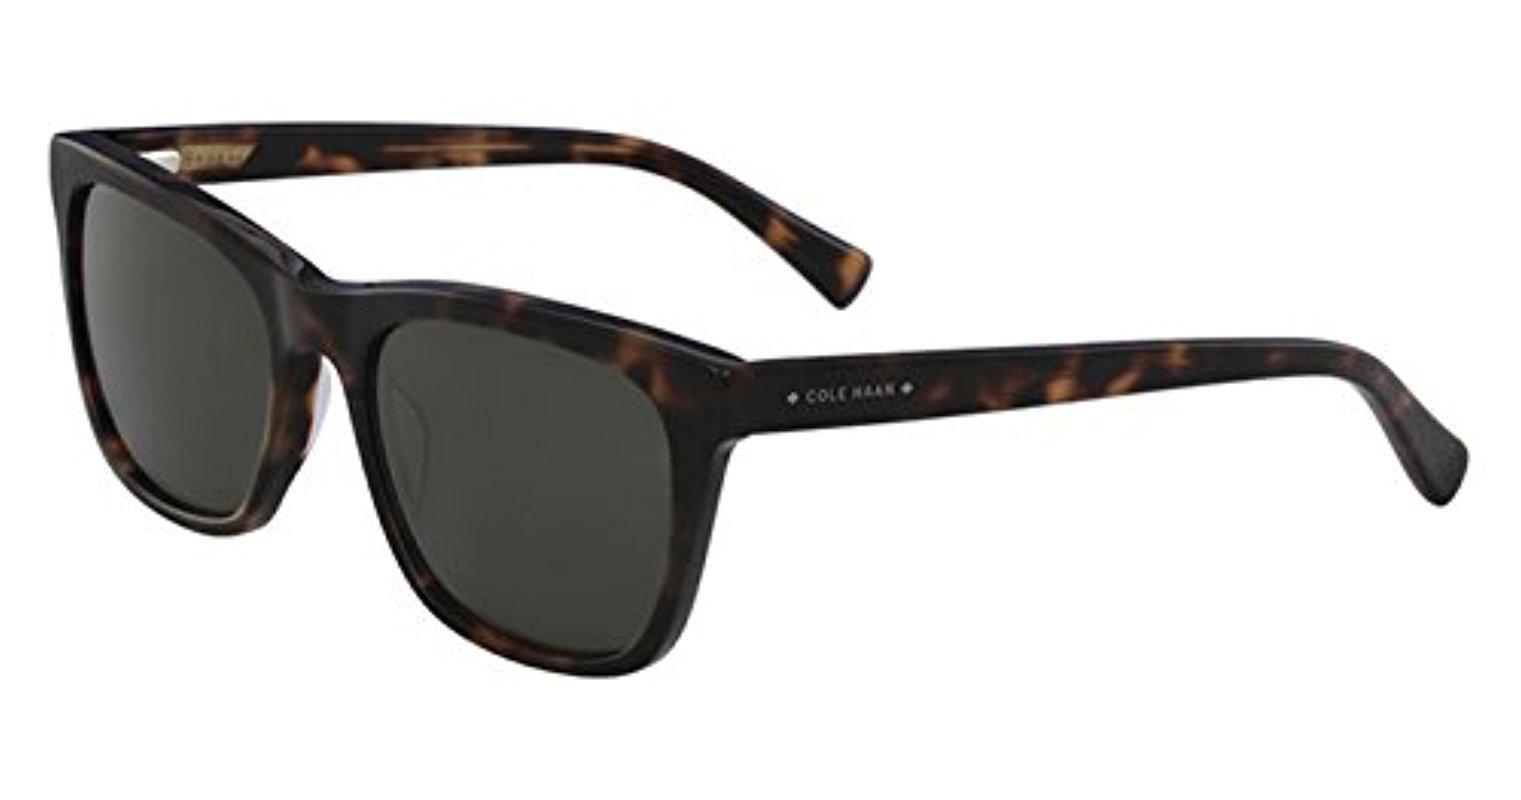 5f3dfec456f Cole Haan. Men s Ch6009 Plastic Square Sunglasses ...